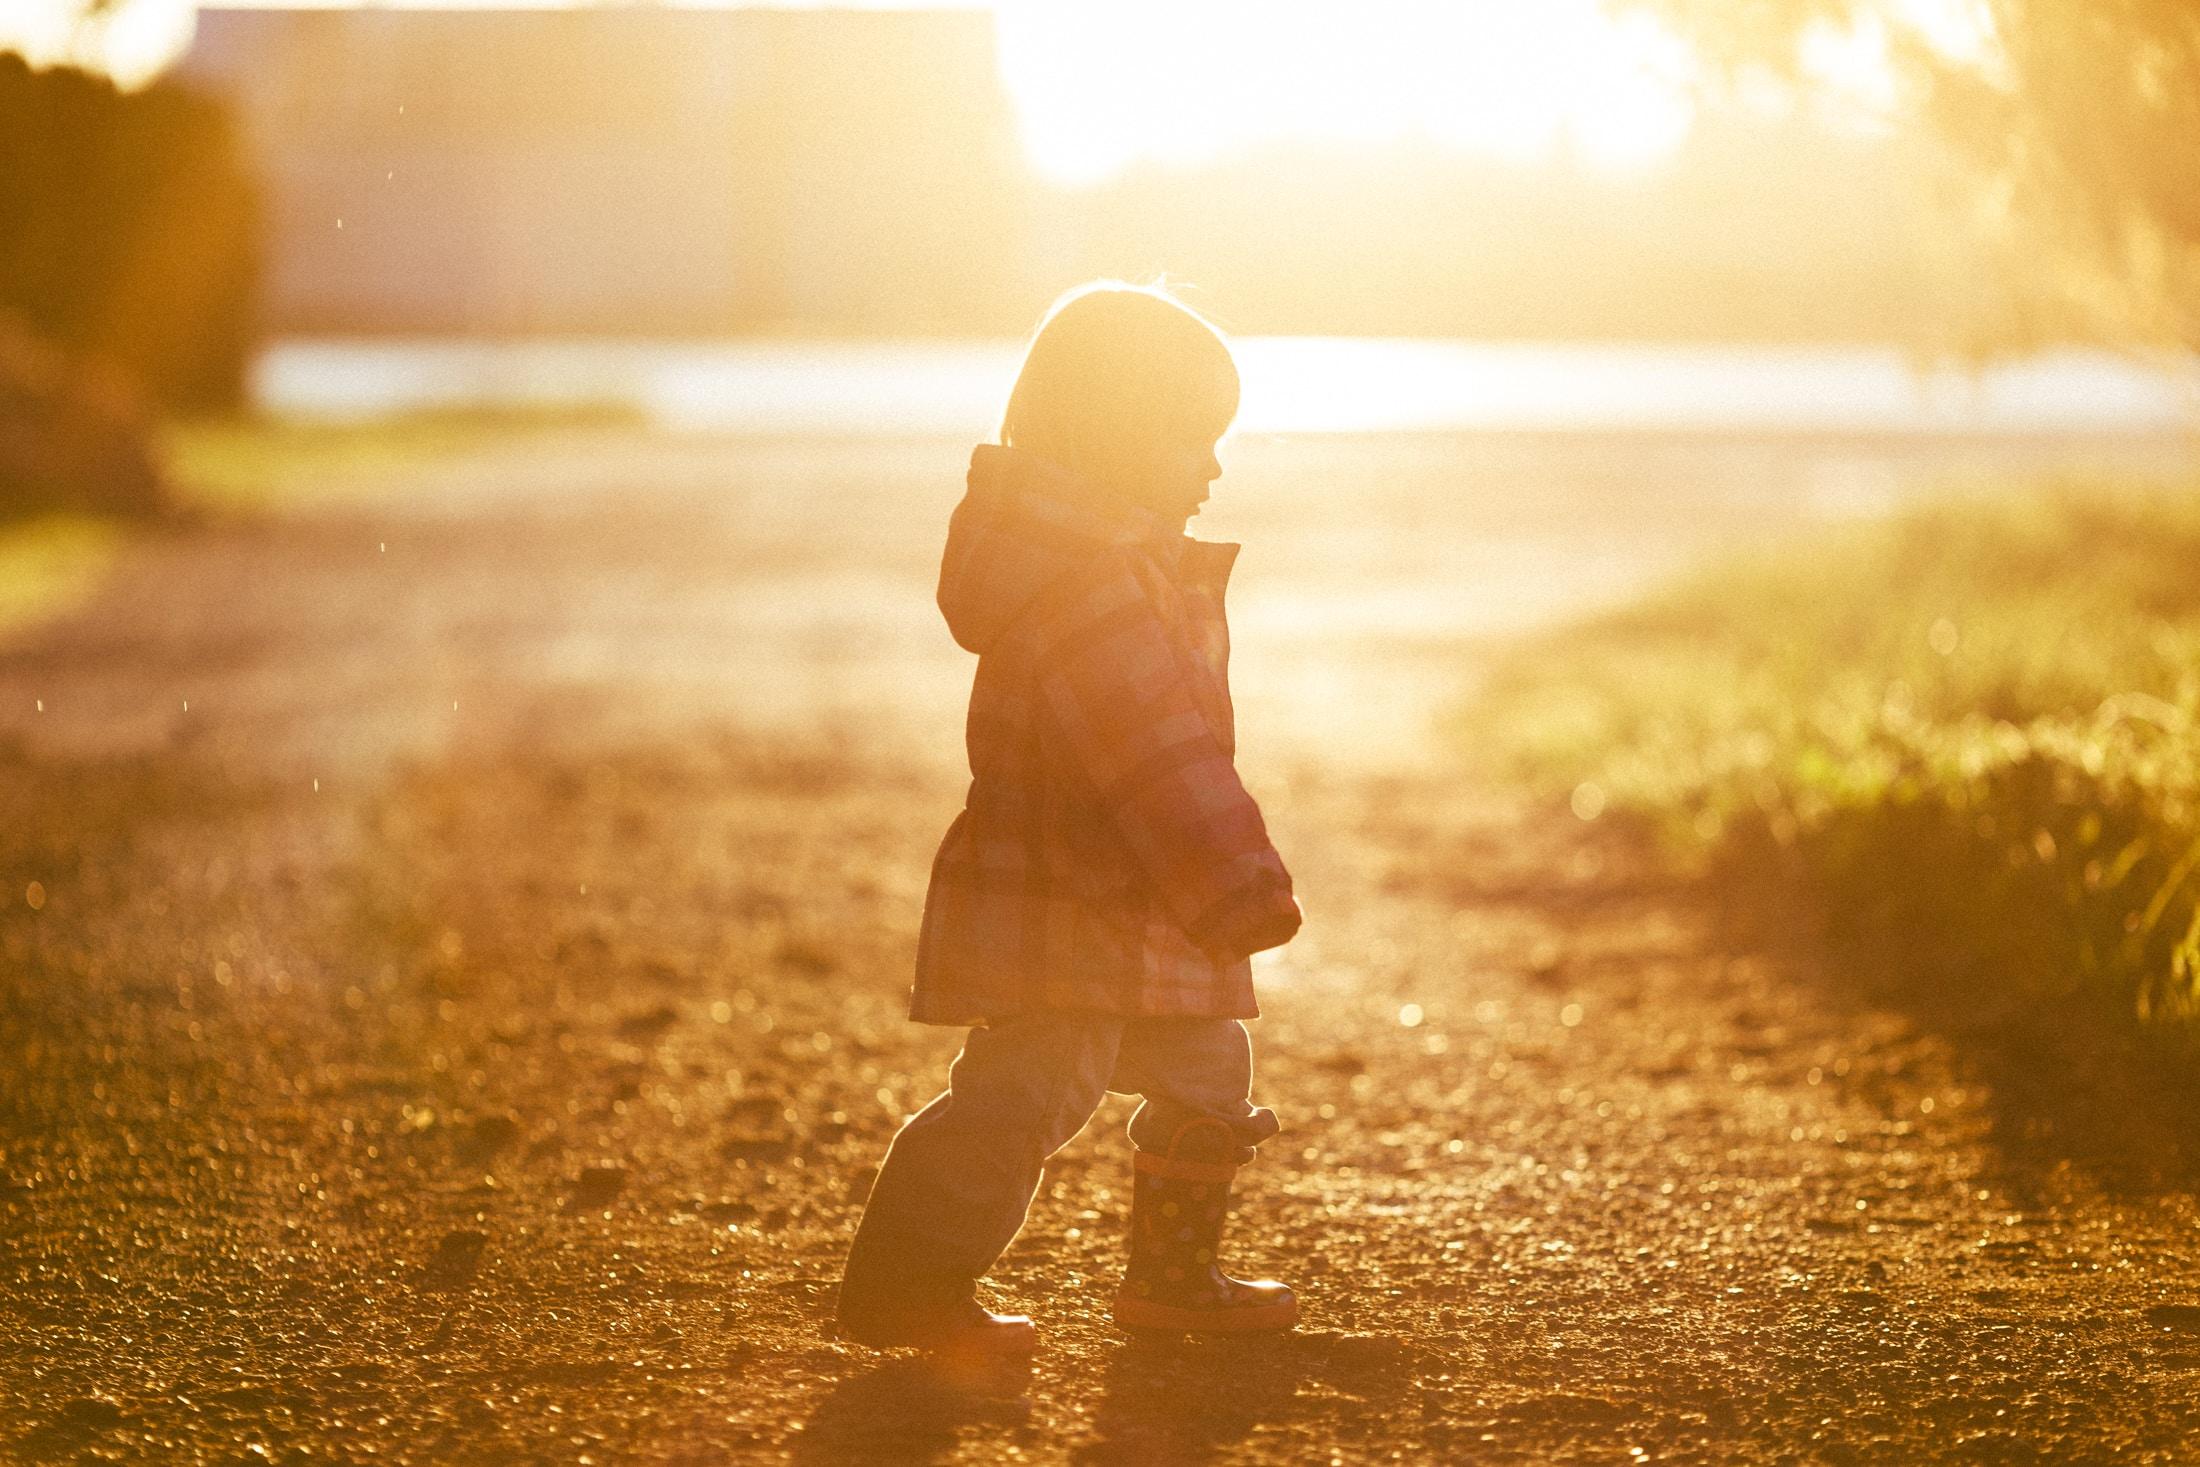 girl walking on ground towards grass